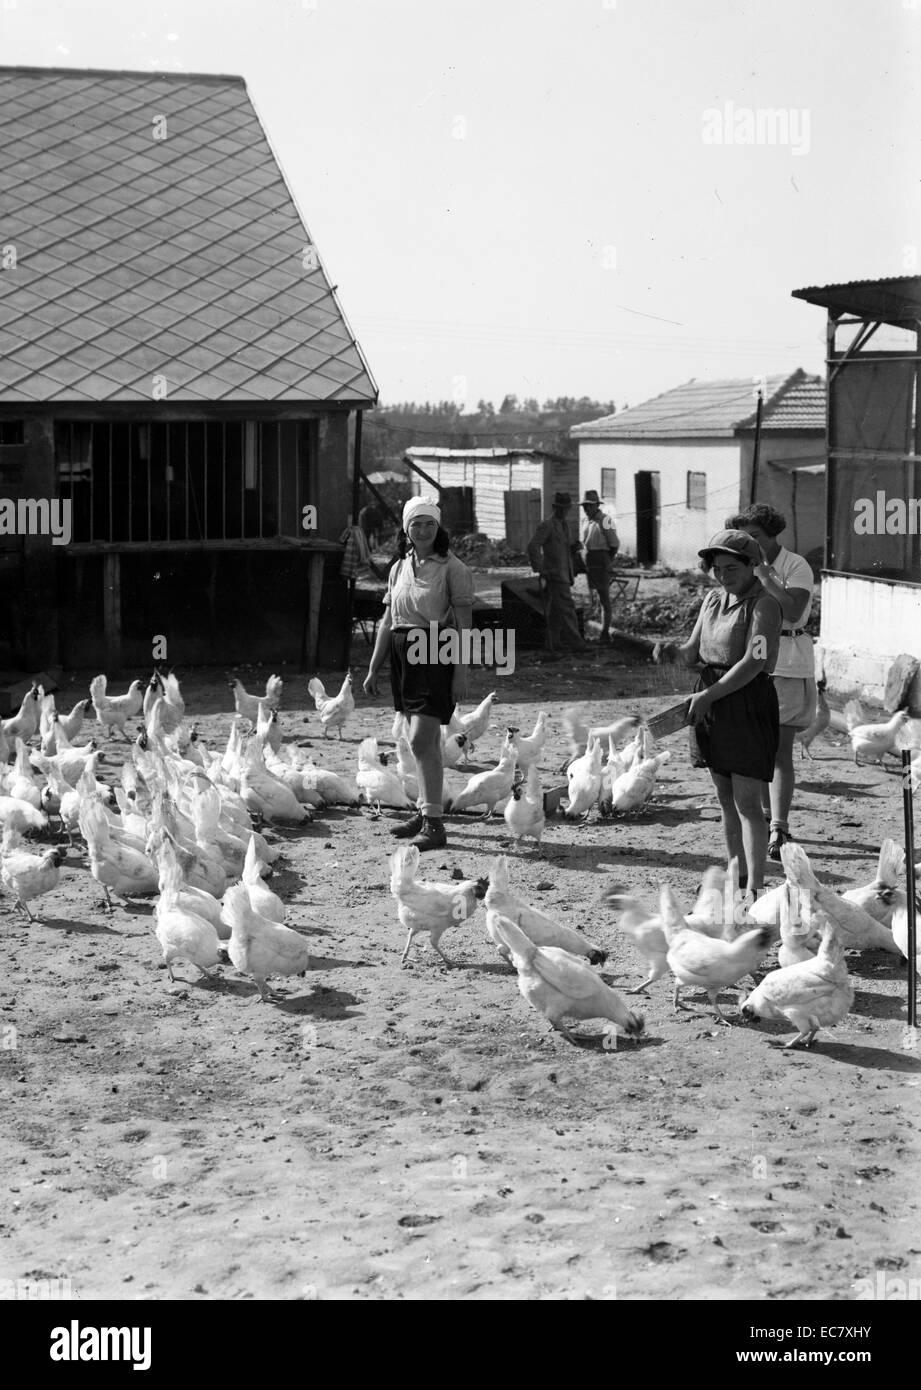 Zionist colonies on Sharon. Borochov, Girls farm, feeding poultry - Stock Image